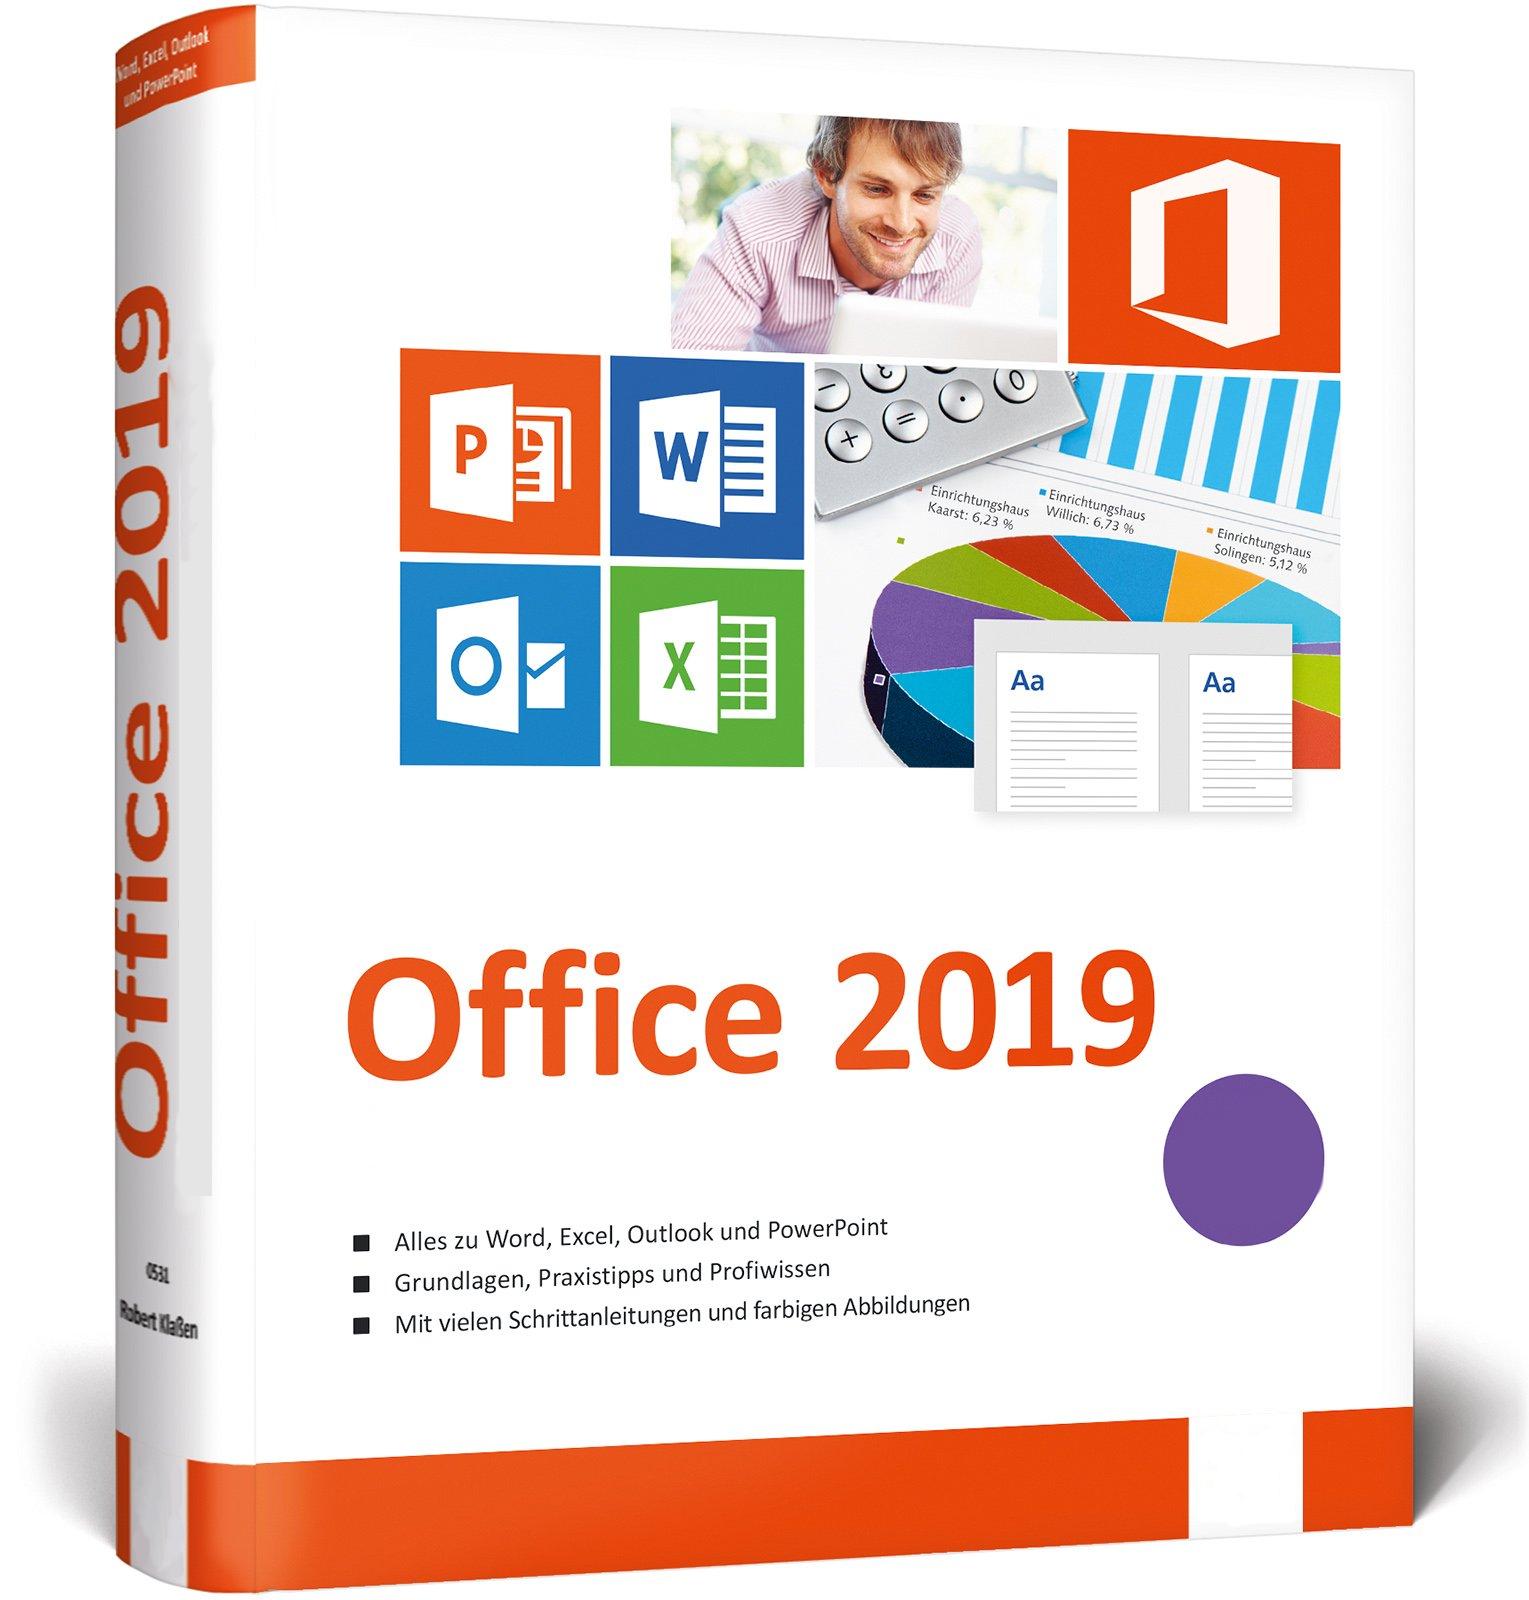 Office Professional Plus 2019 v1811 Build 11029 20079